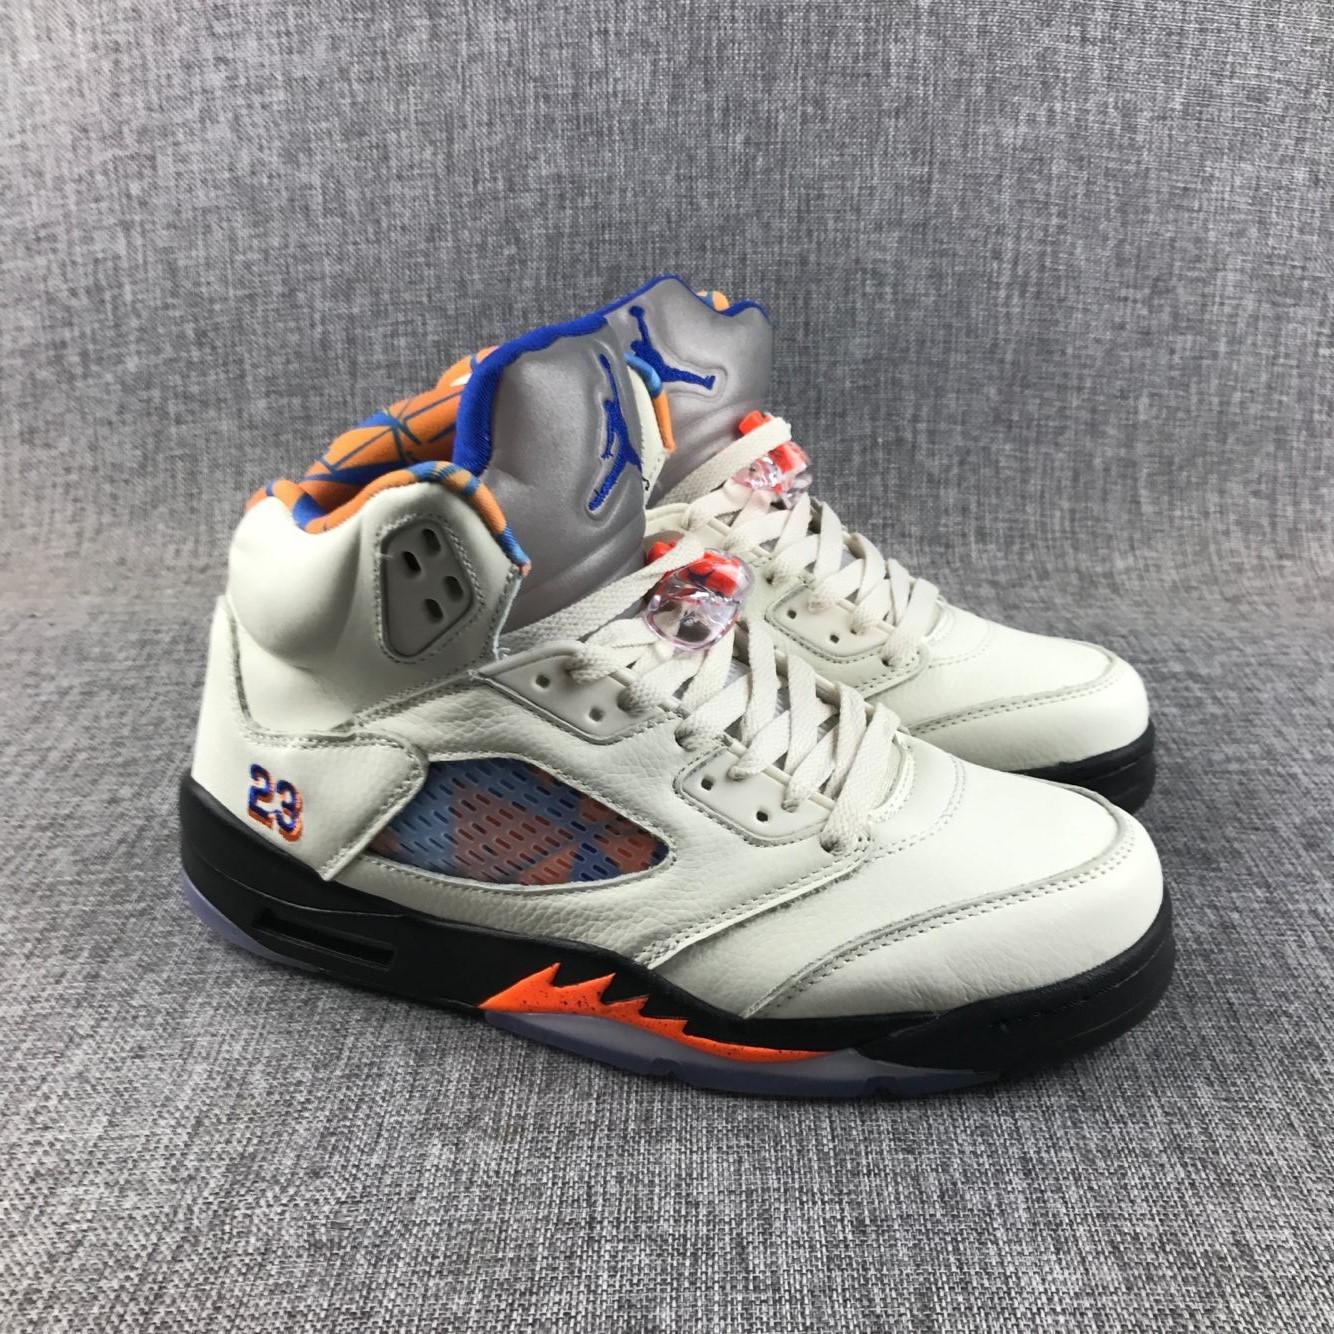 f9dec0bc7d787e Men Basketball Shoes New Air Retro 5 Shoes on Storenvy